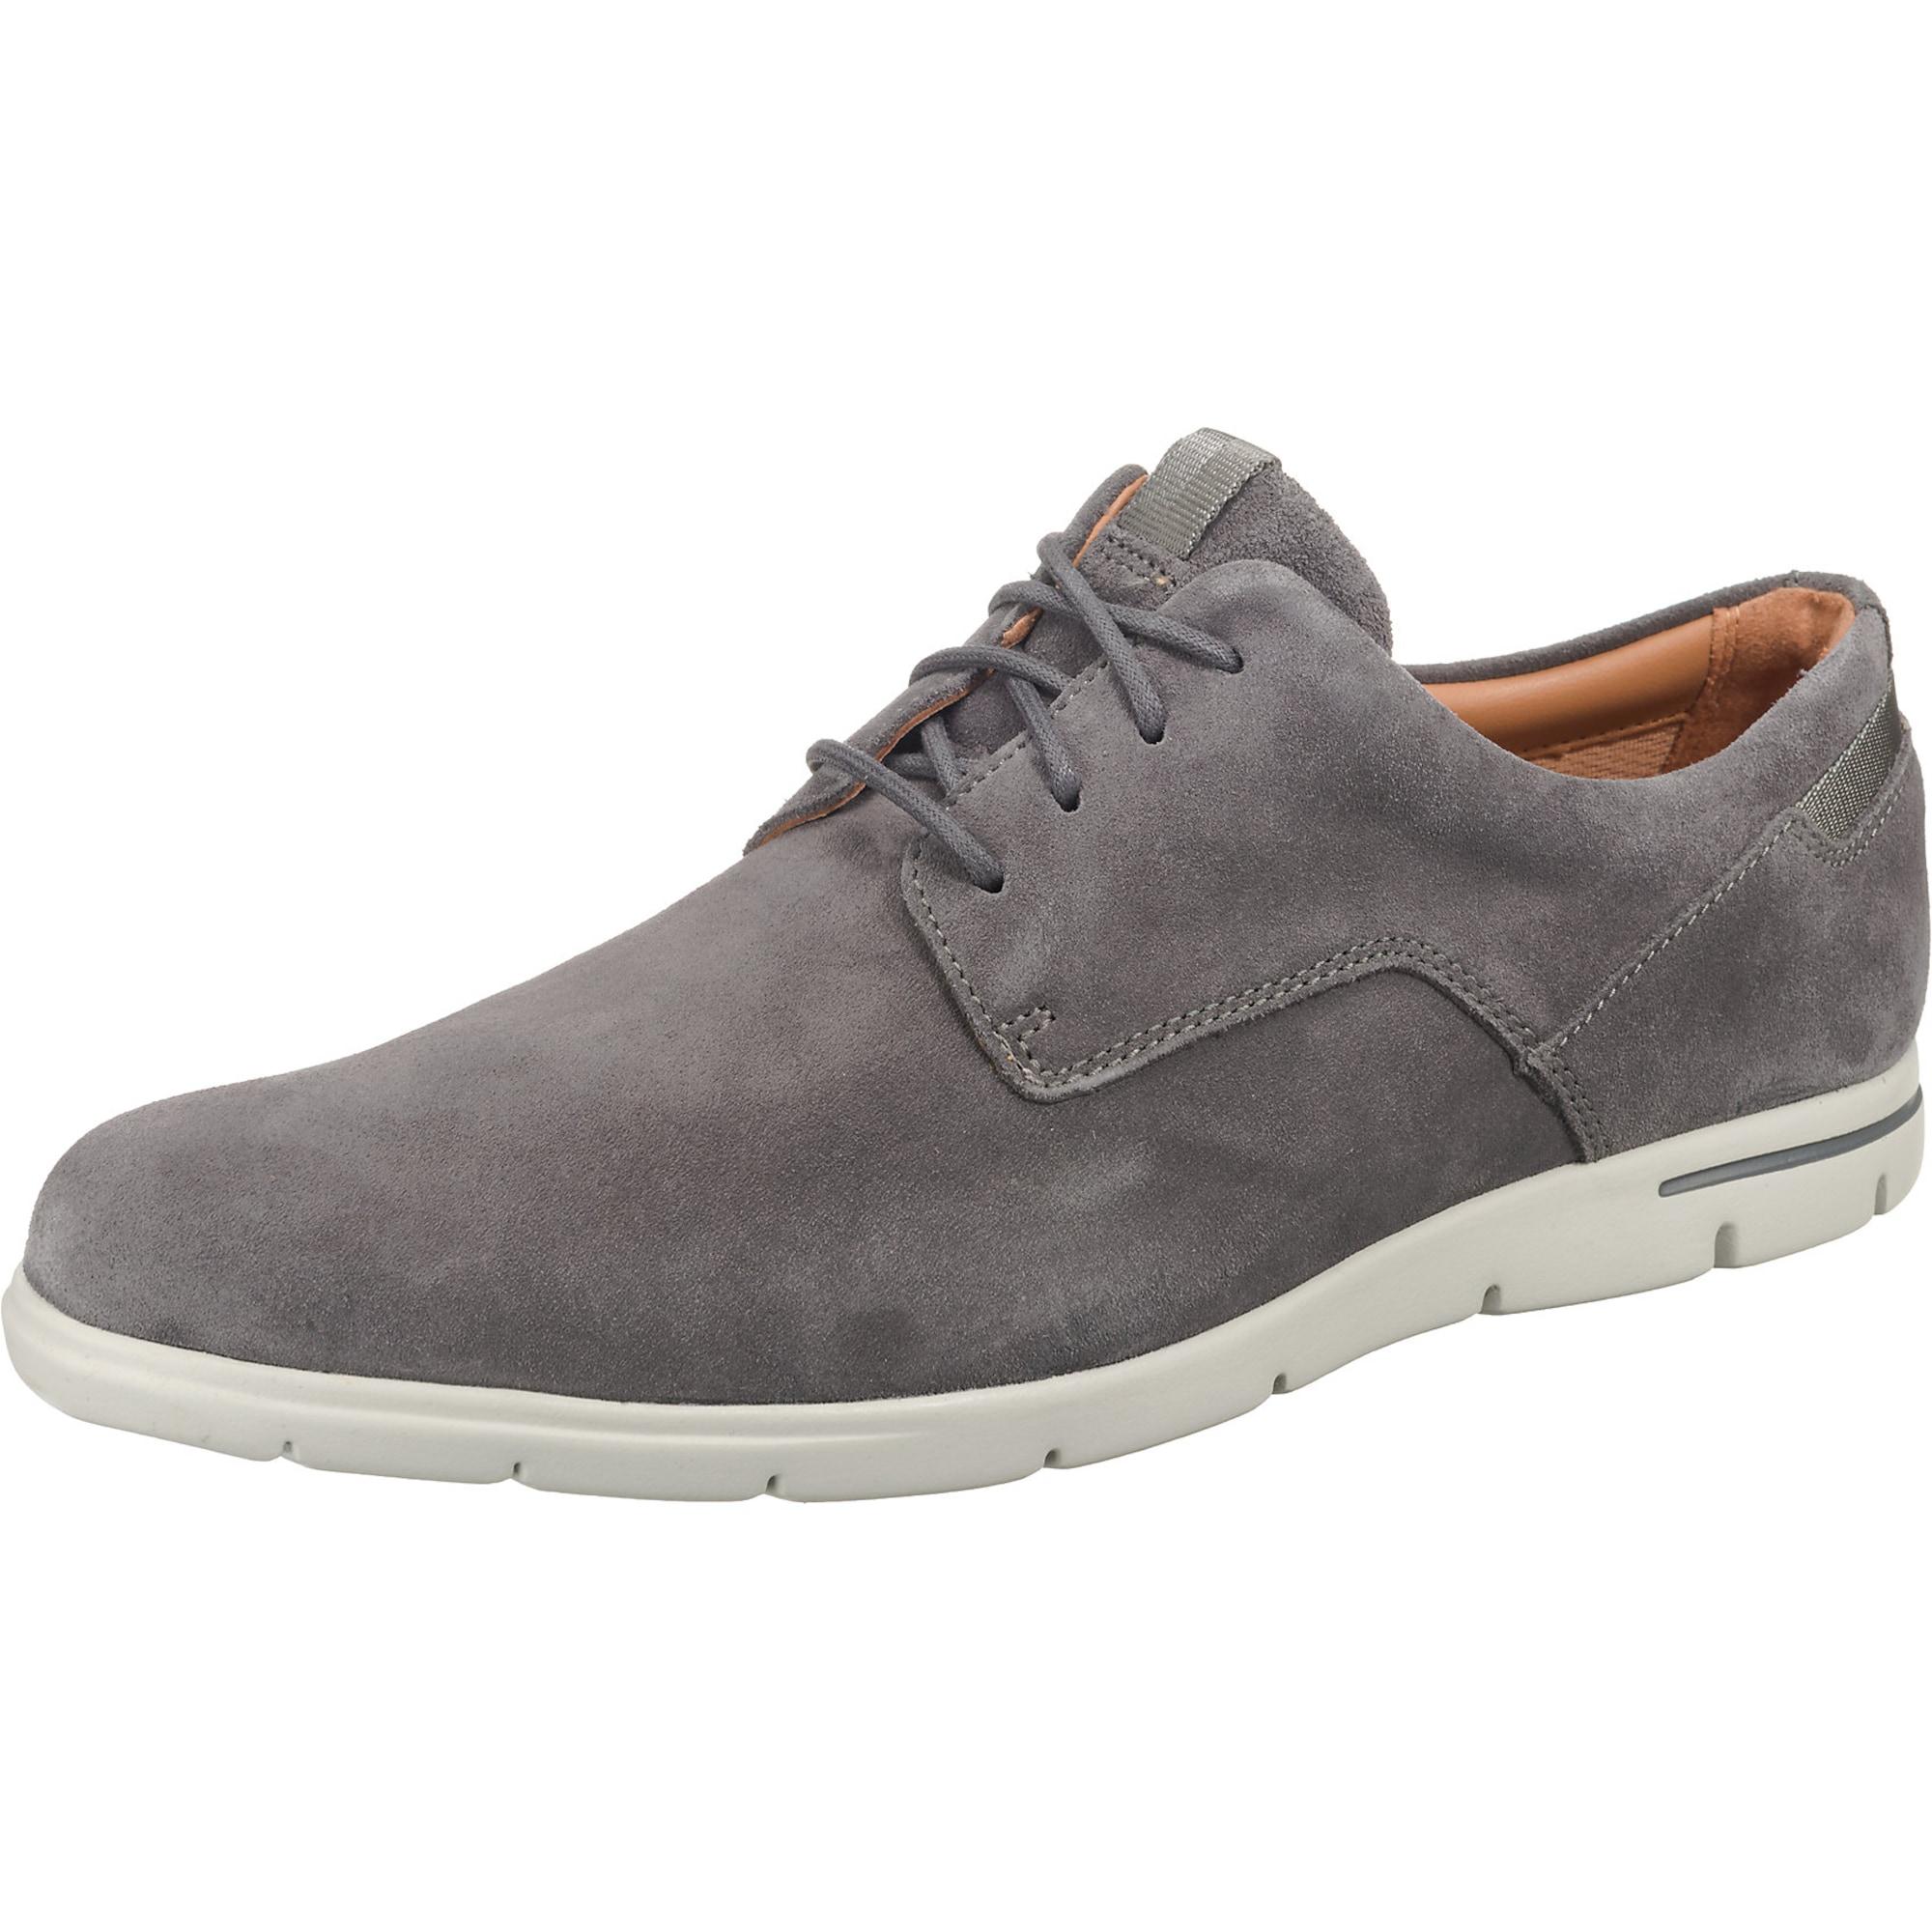 Šněrovací boty Vennor Walk šedá CLARKS